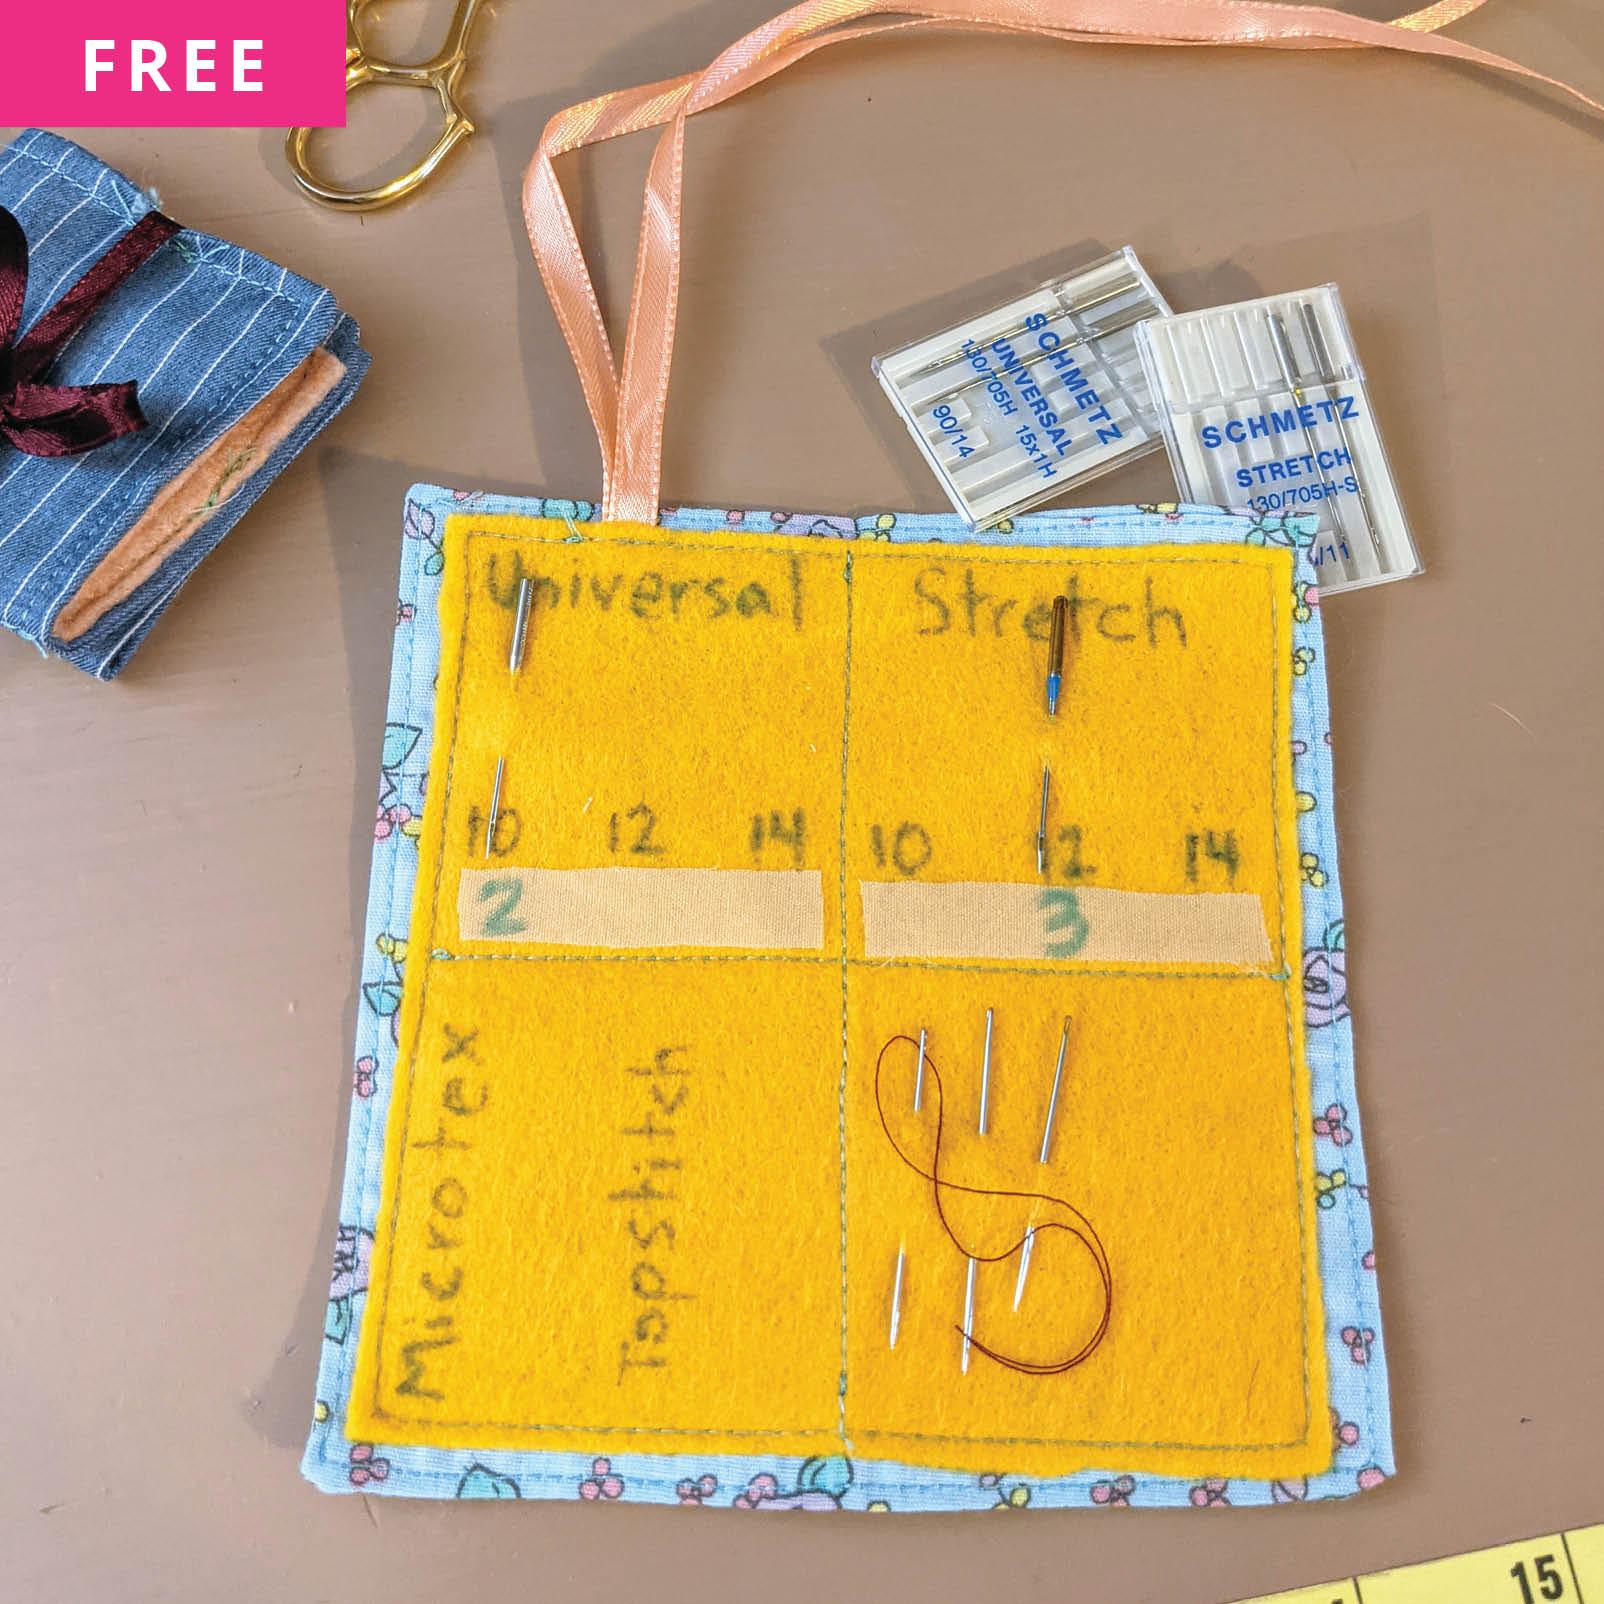 Free Sewing Pattern - Fold-Up Fabric Needle Holder